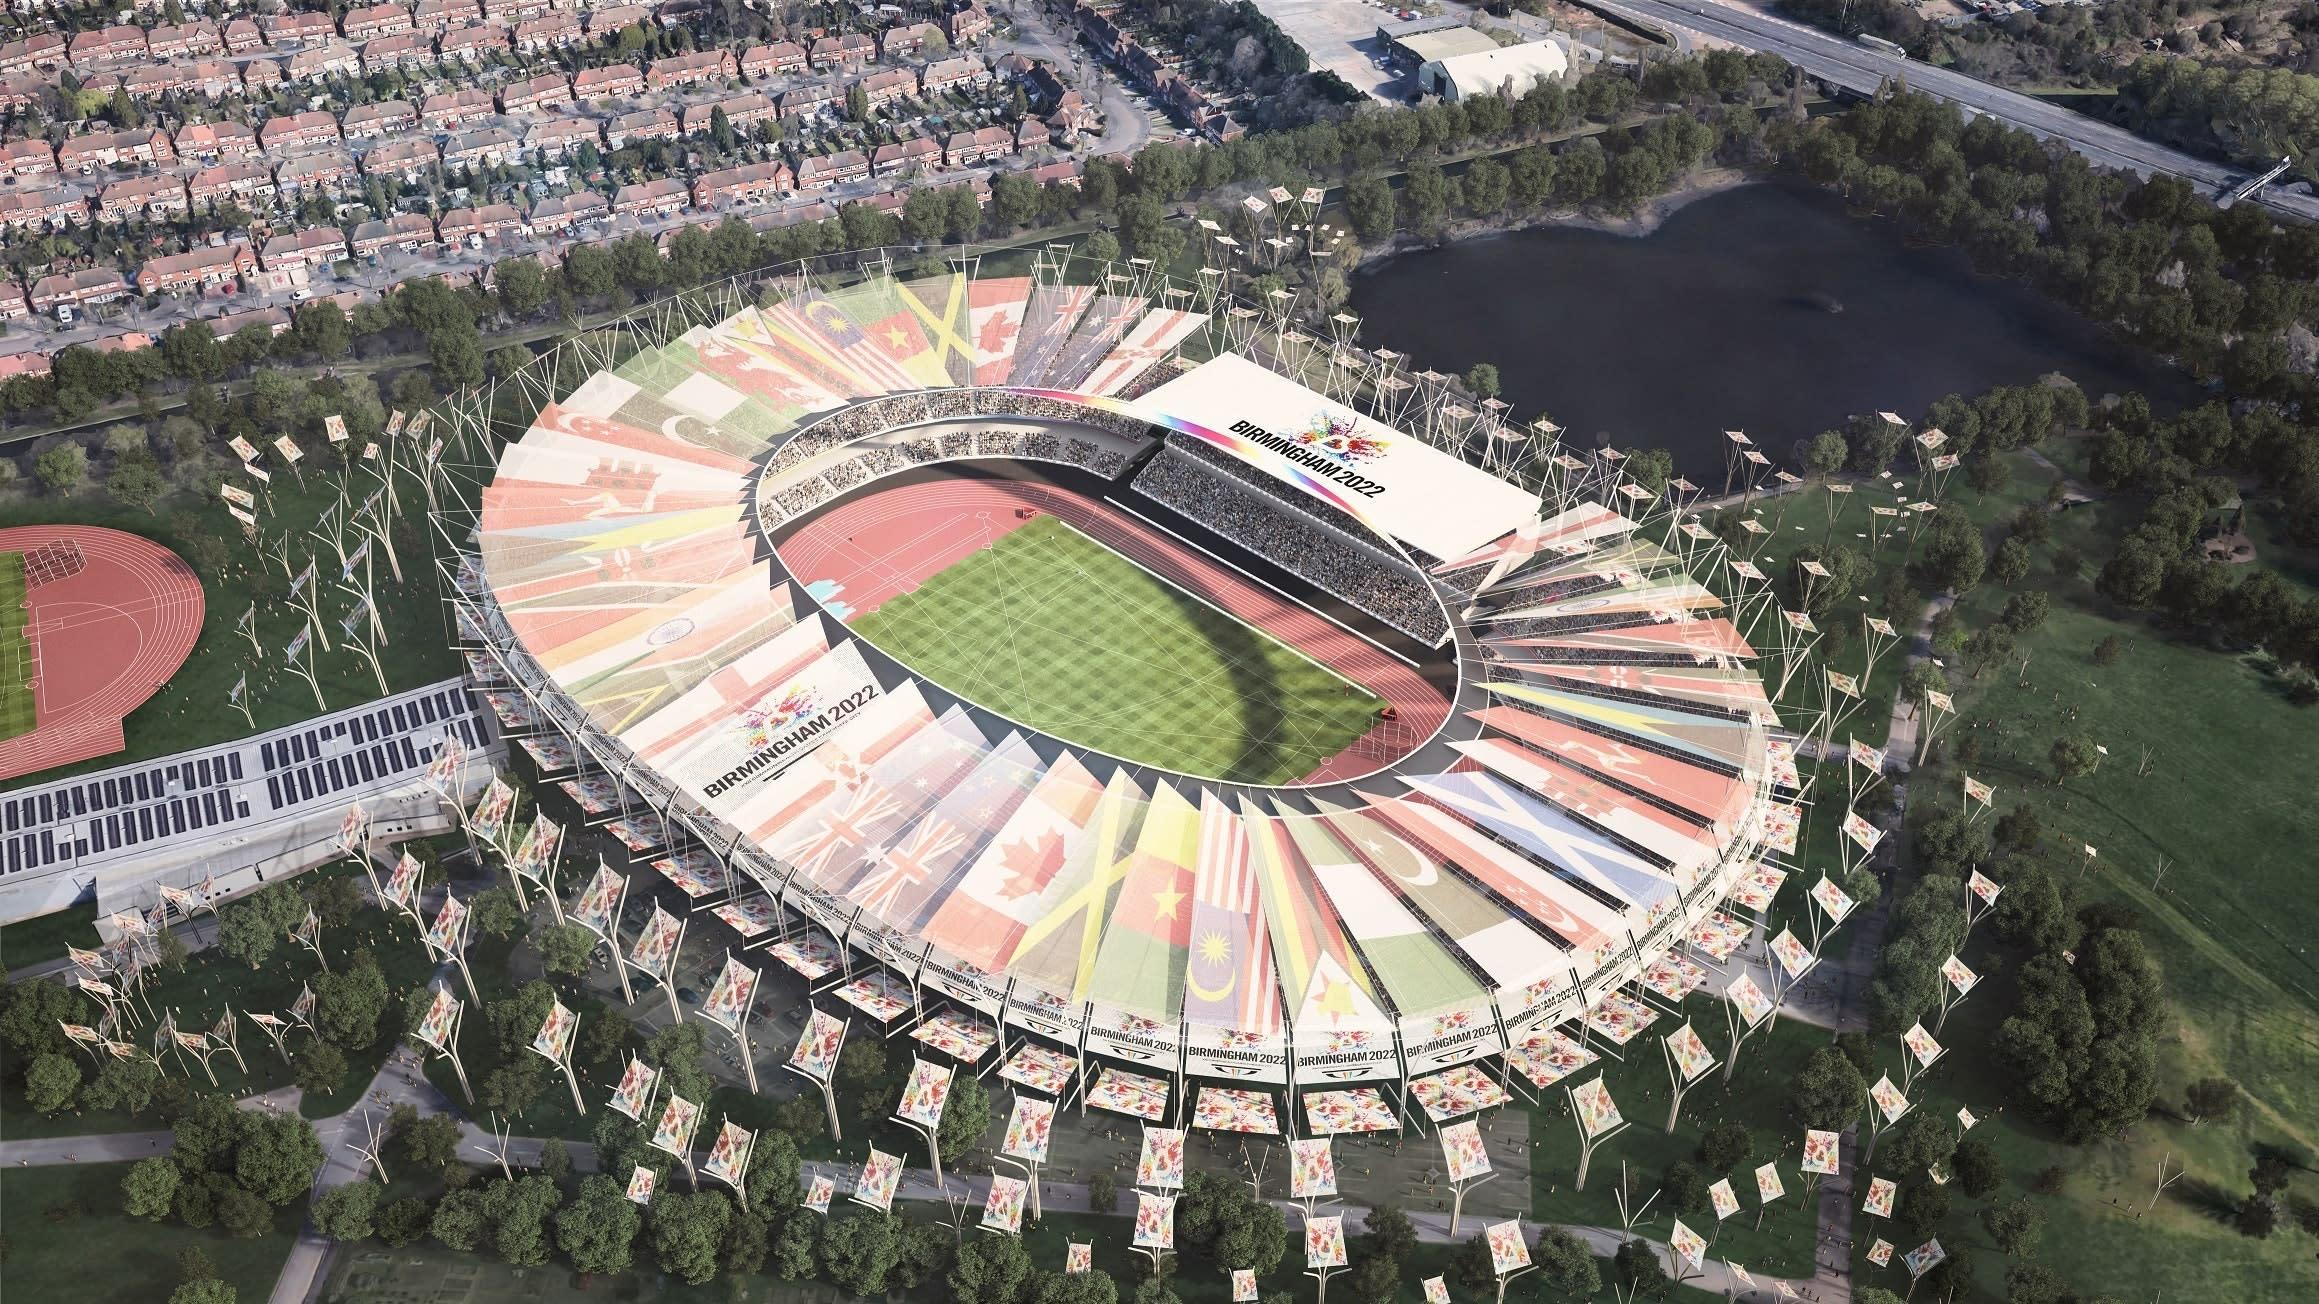 Birmingham 2022 scraps plan for single-site athletes' village at Perry Barr